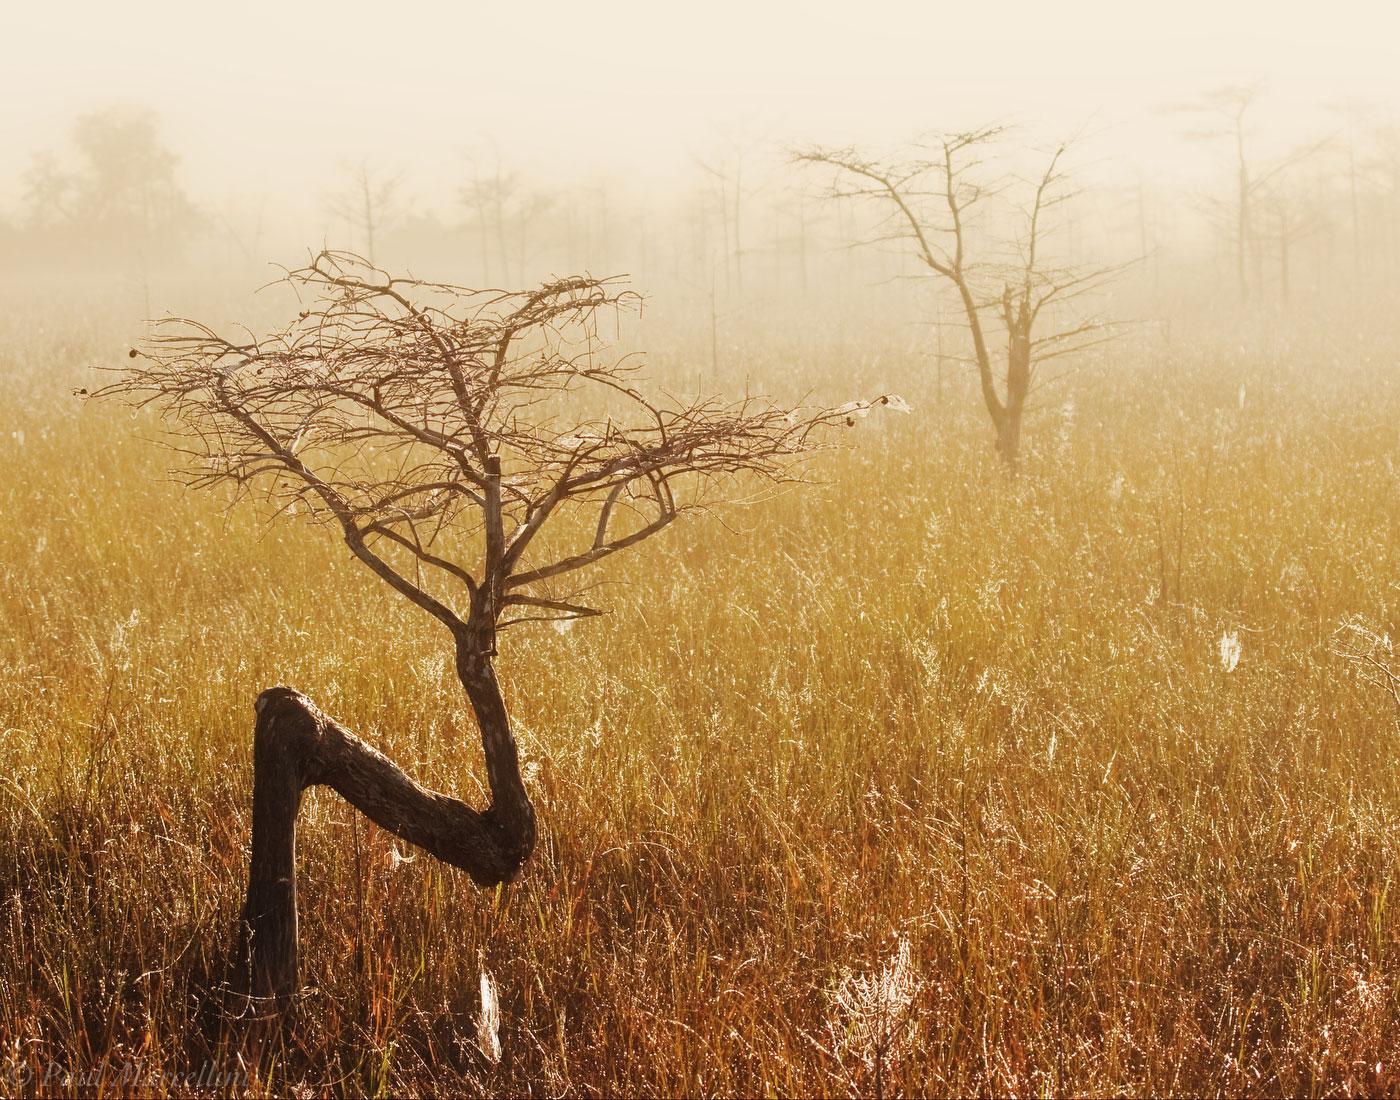 dwarf cypress, everglades, foggy, Florida, nature, photography, florida national parks, photo